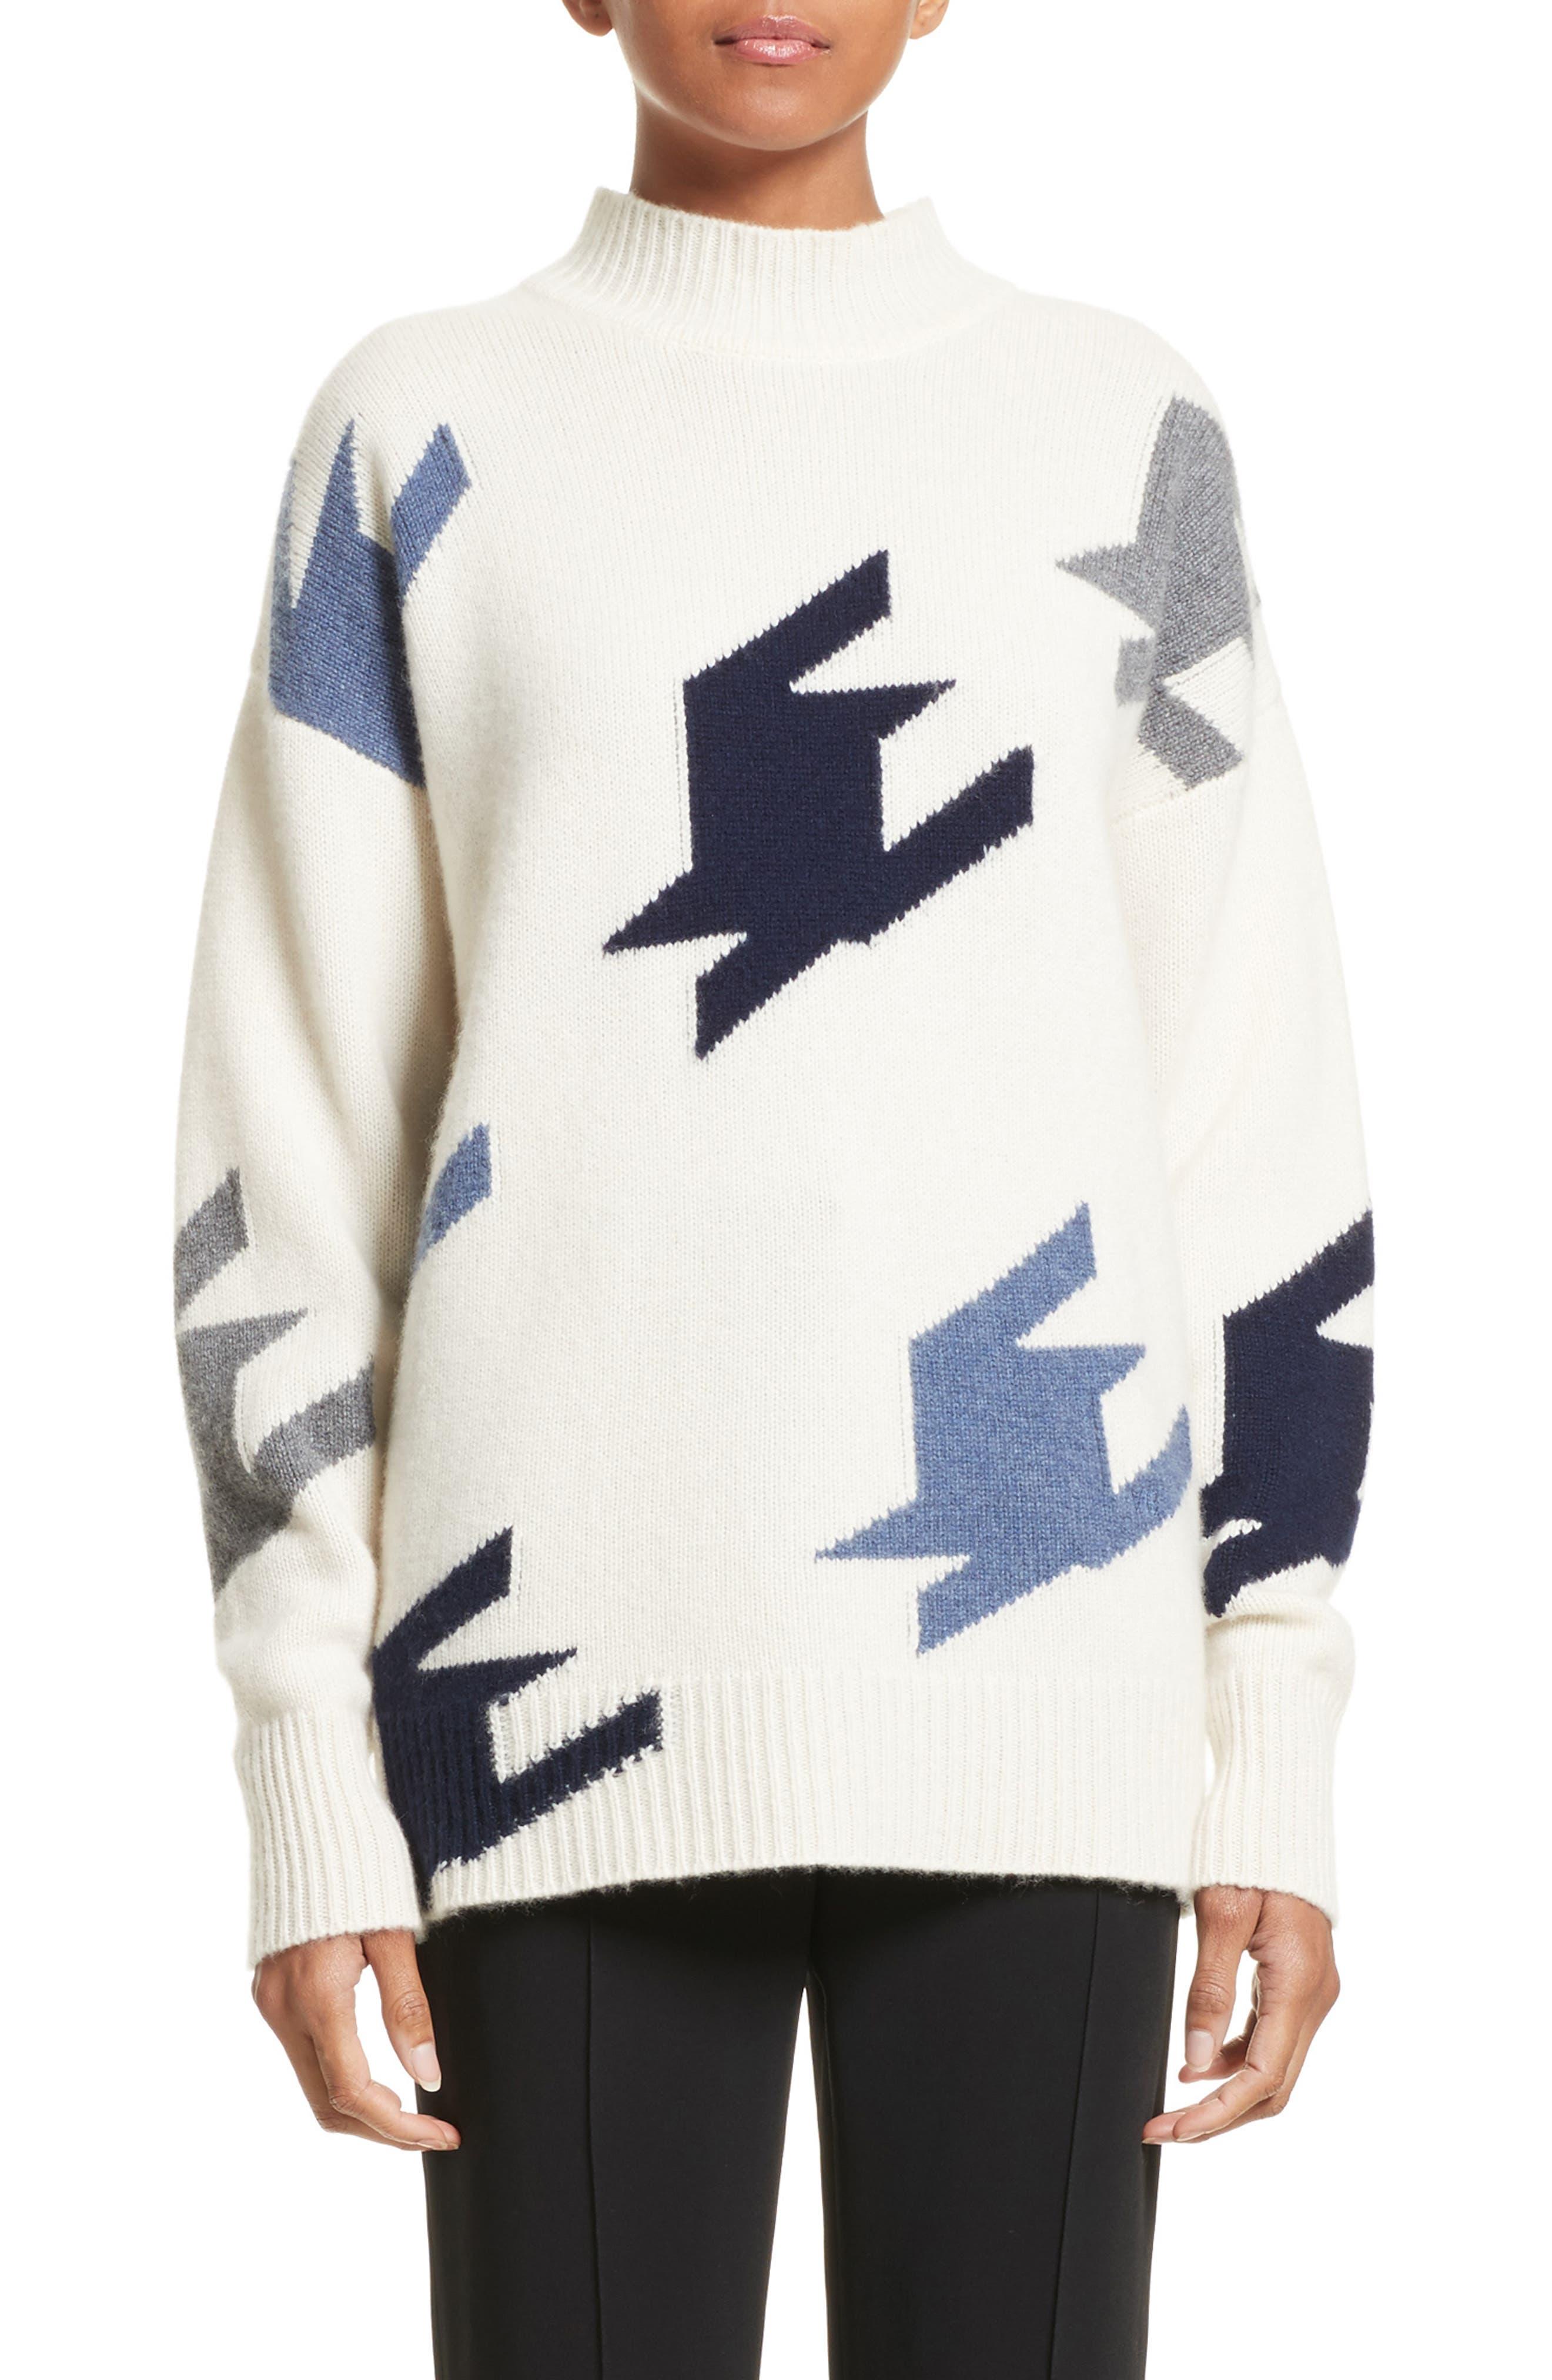 VICTORIA BECKHAM Houndstooth Cashmere Sweater, Main, color, 905